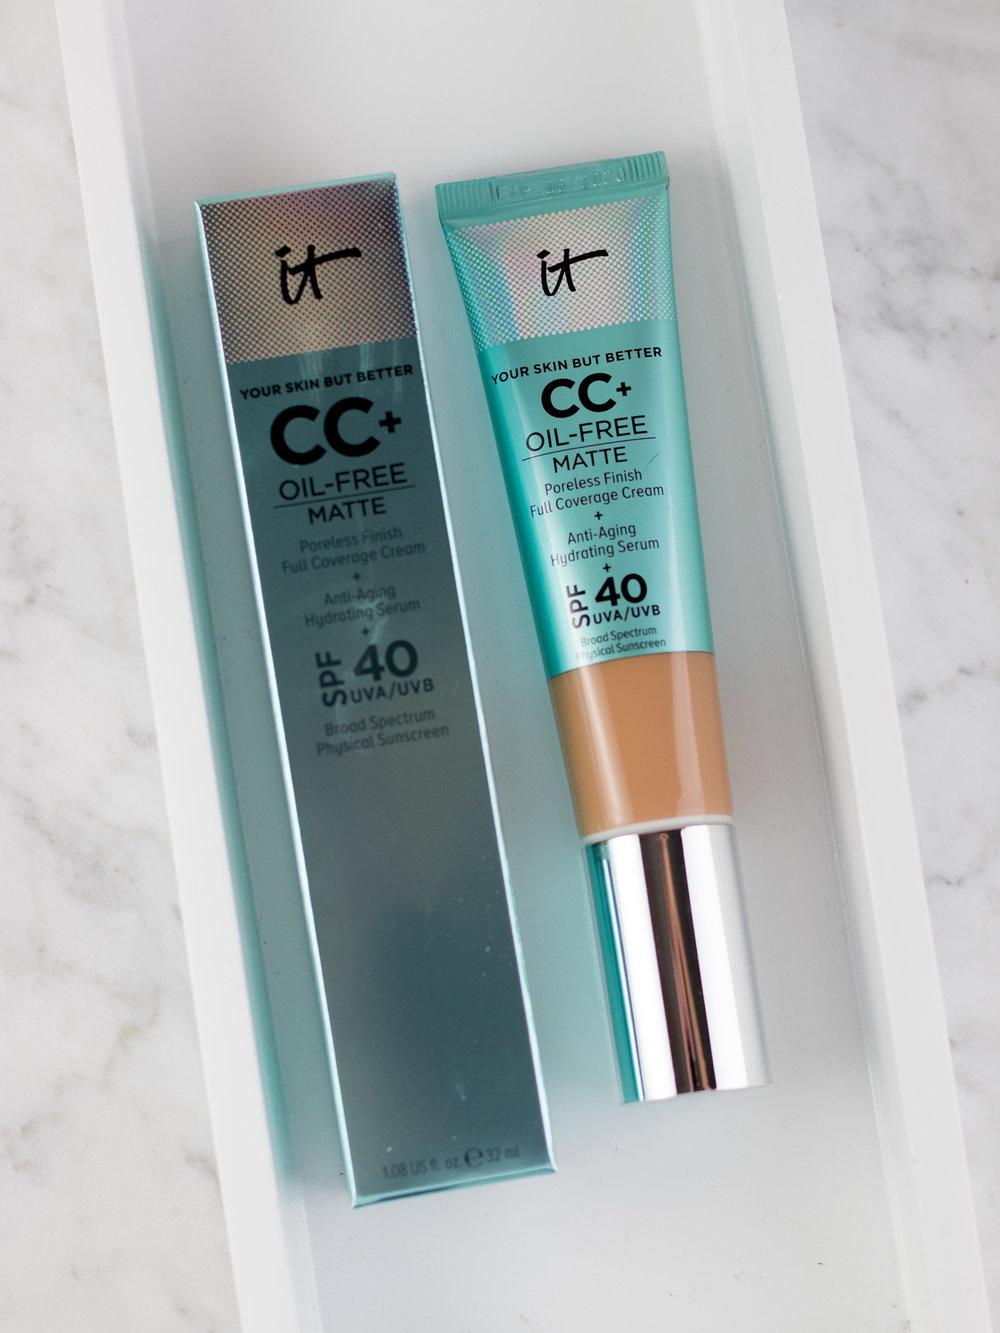 IT Cosmetics CC+ Cream Oil-Free Matte SPF 40 Review + Photos